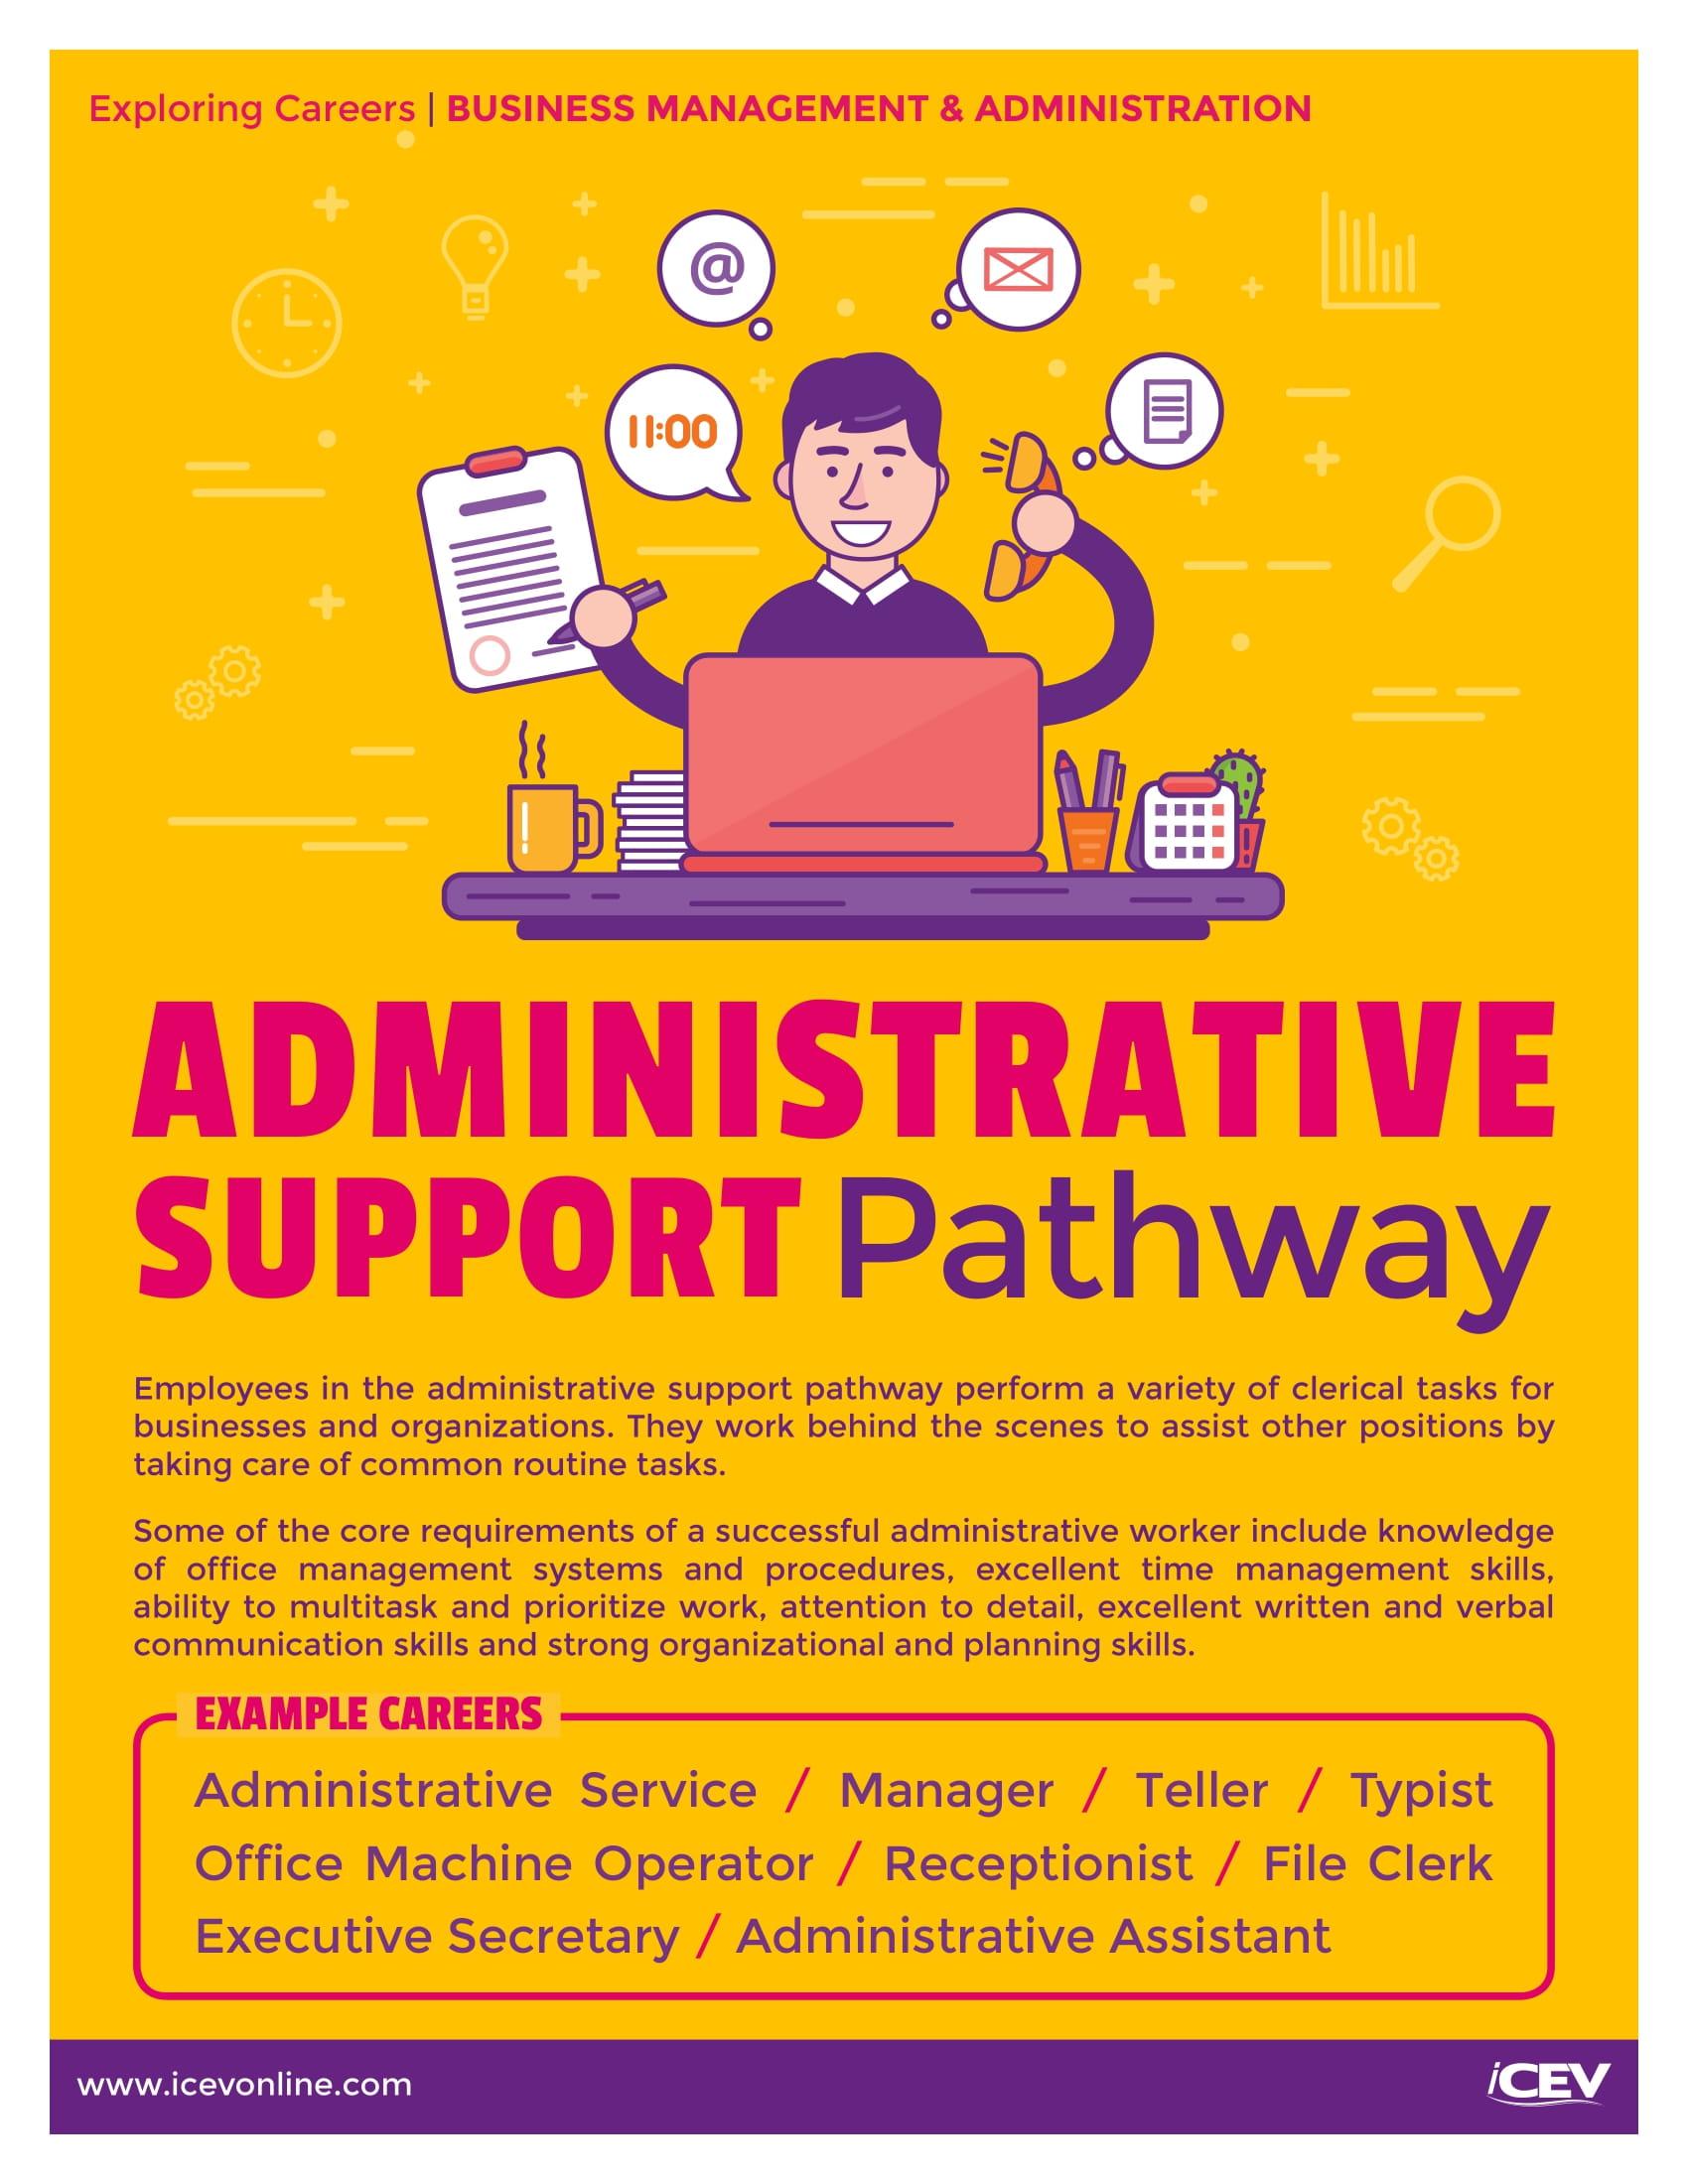 Business Management & Administration